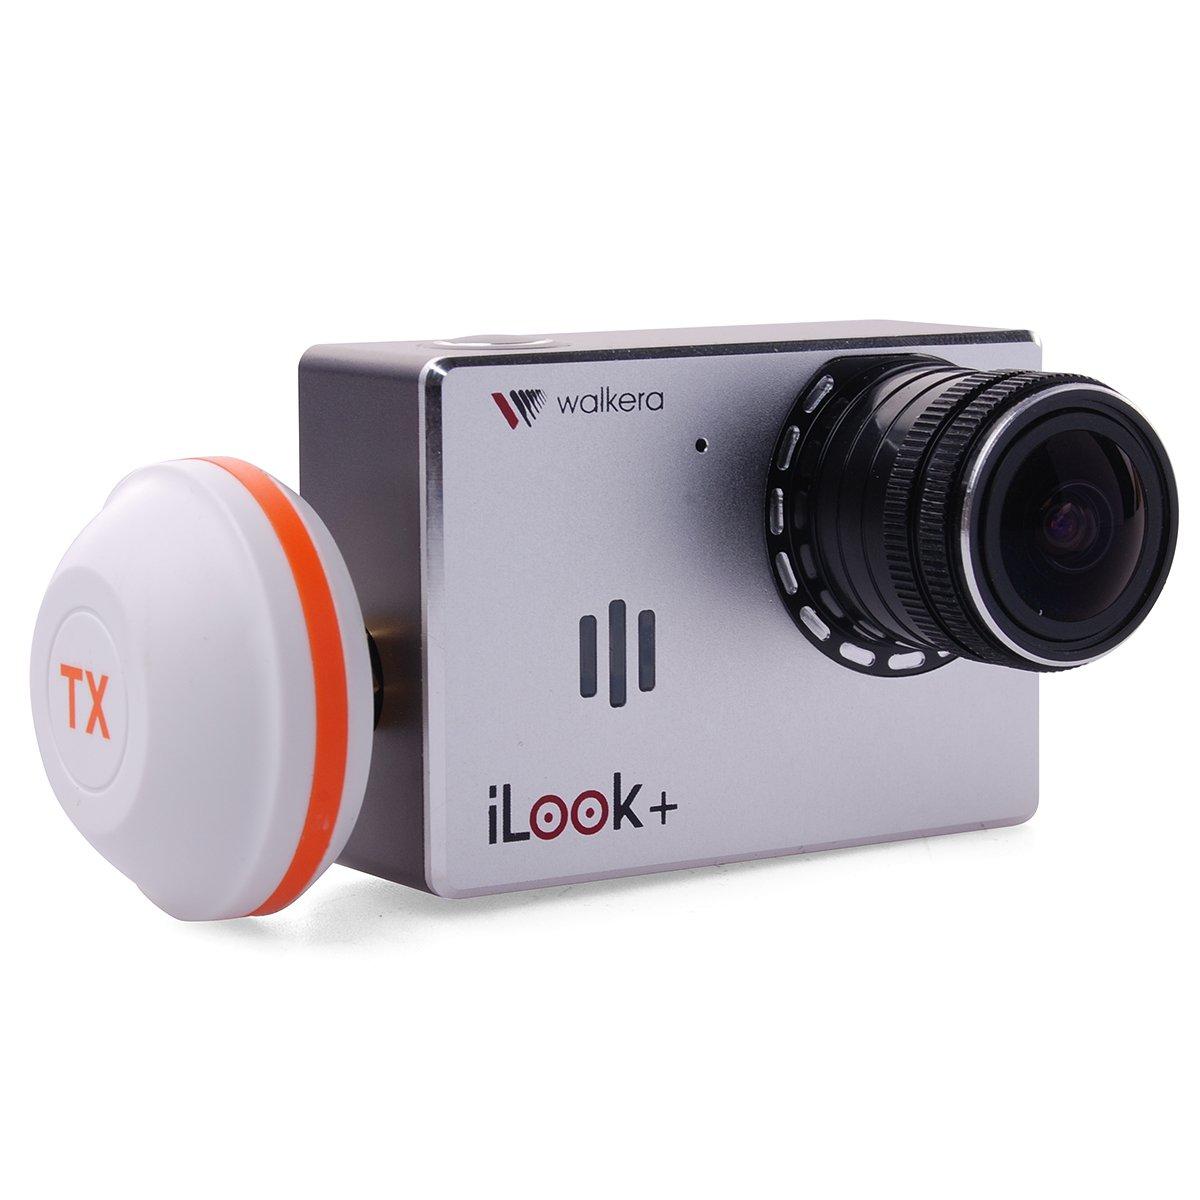 Walkera iLook+ HD FPV Weiel Kamara für QR: Amazon.de: Kamera on